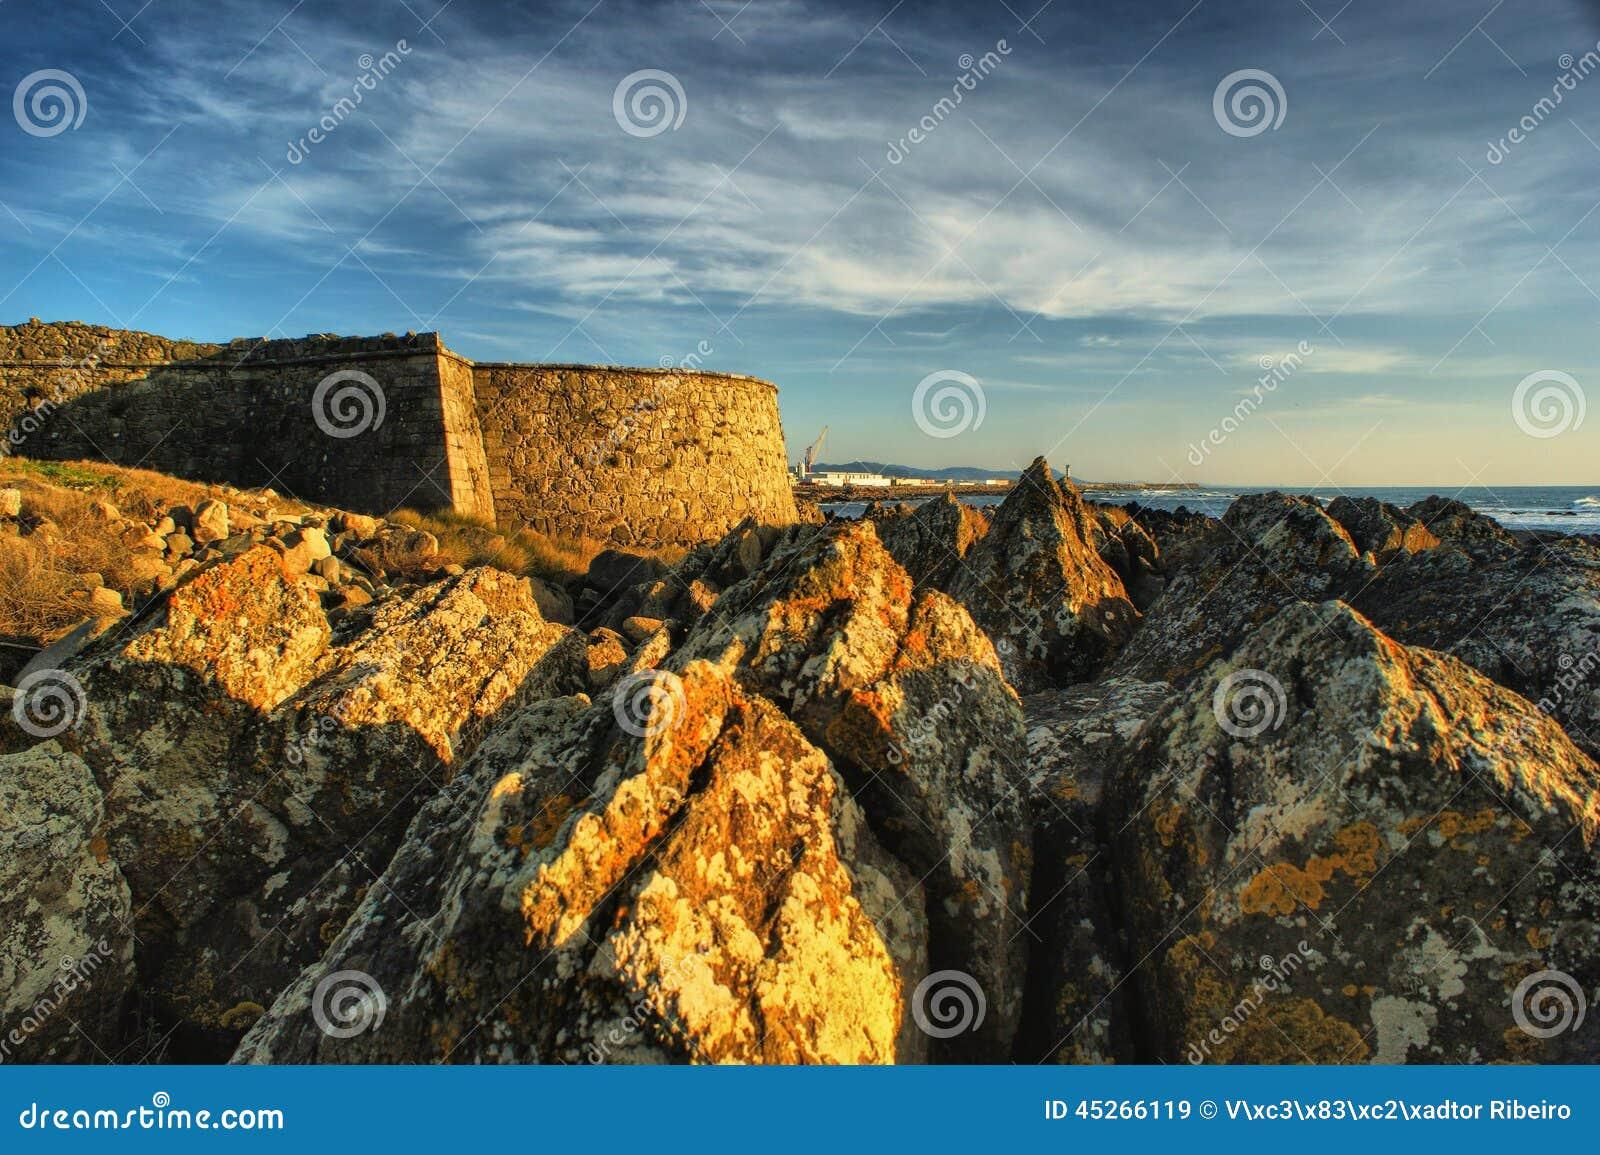 Carreco fortress in Viana do Castelo